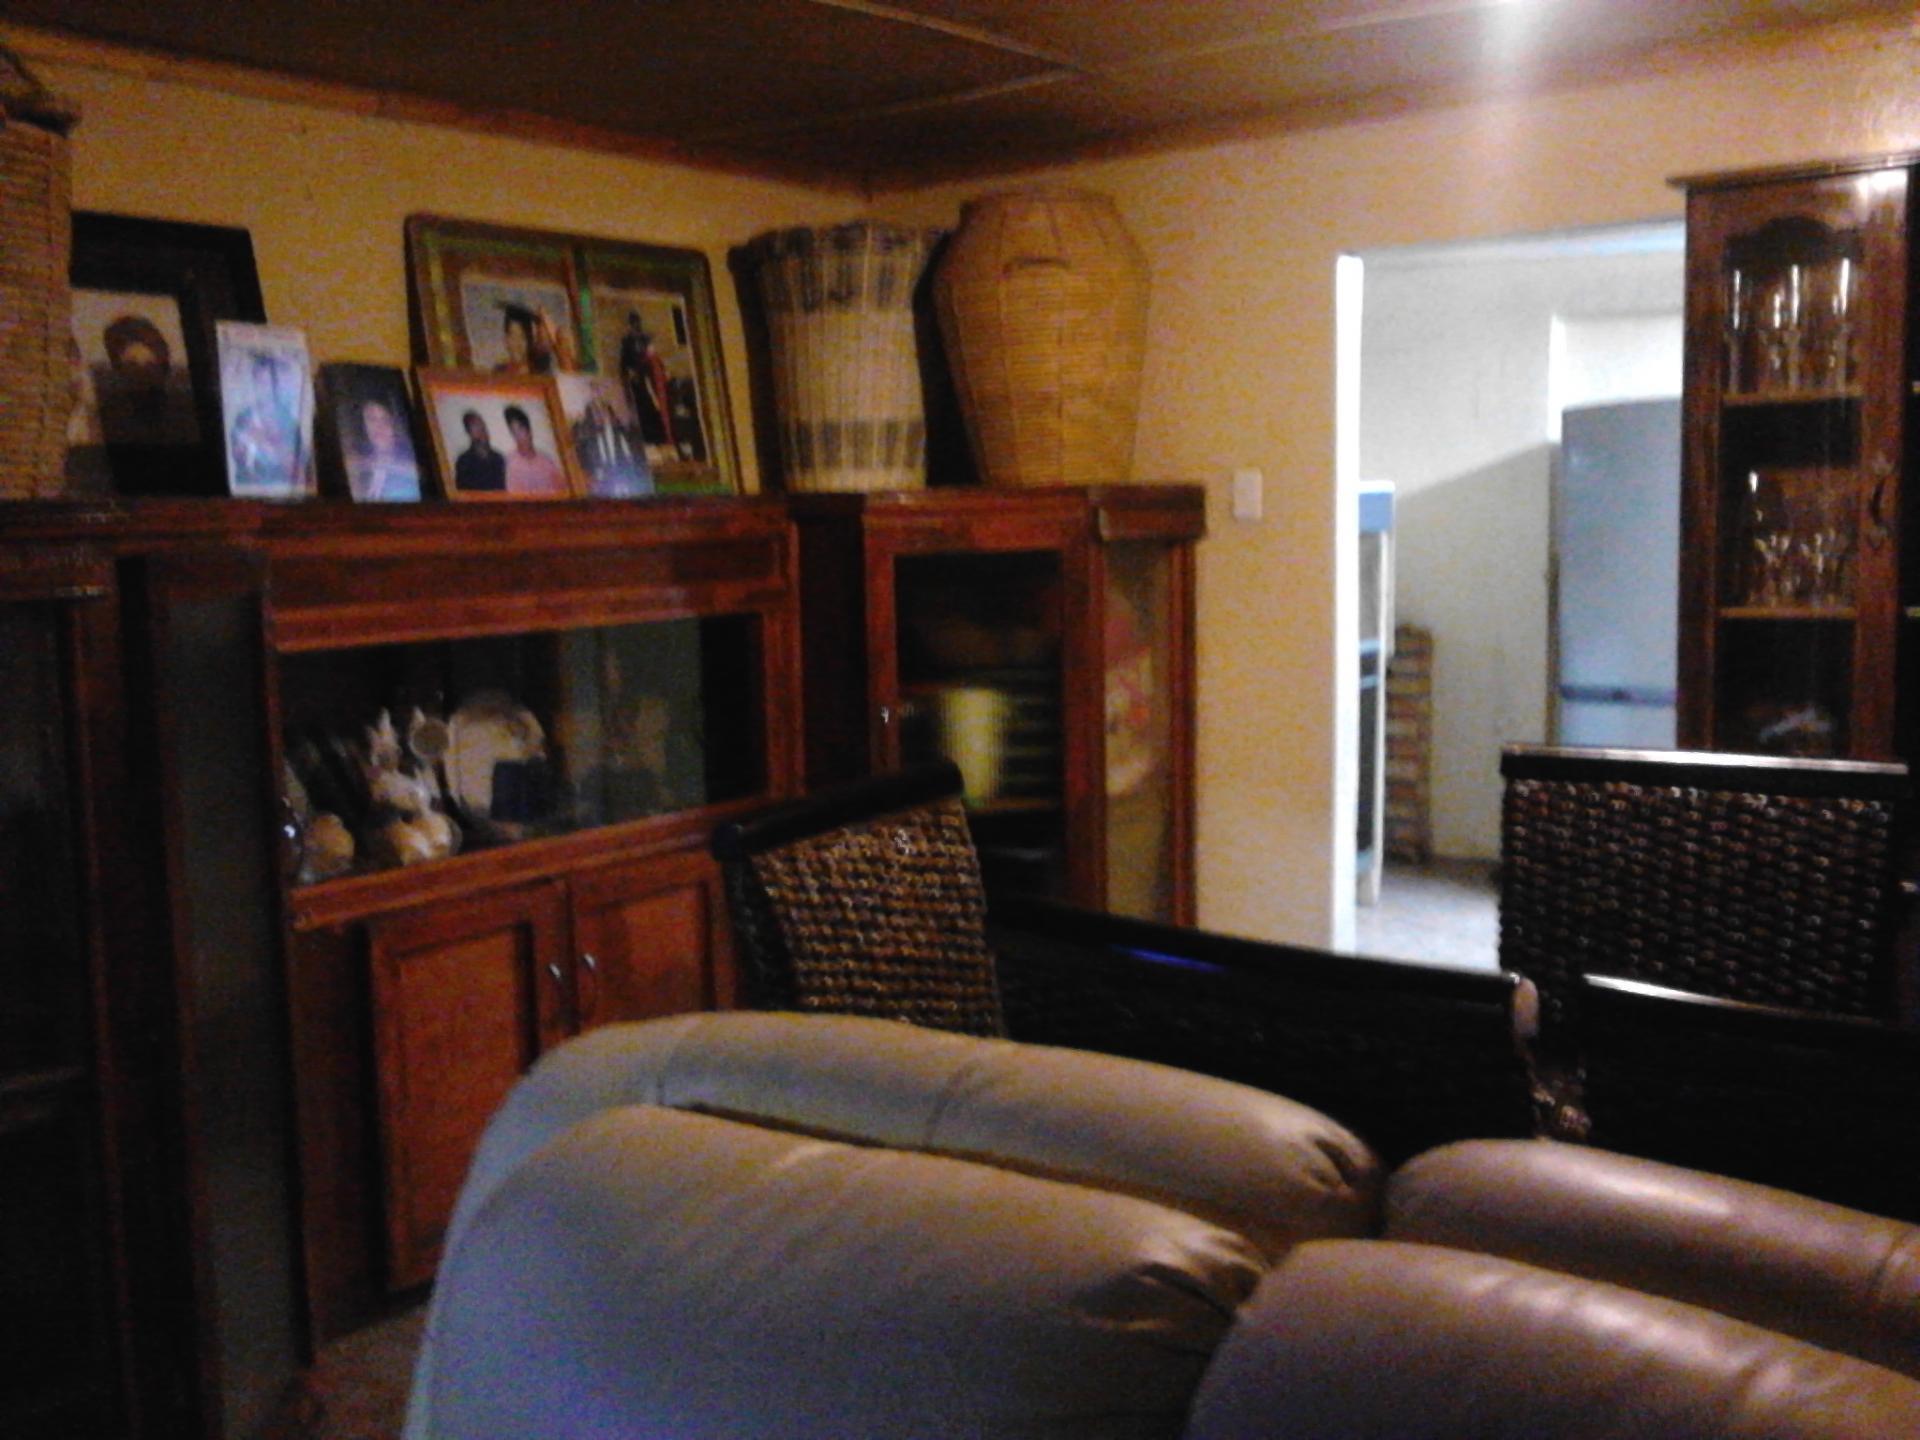 3 Bedroom House For Sale For Sale In Port Elizabeth Central Private Sale Mr094230 Myroof